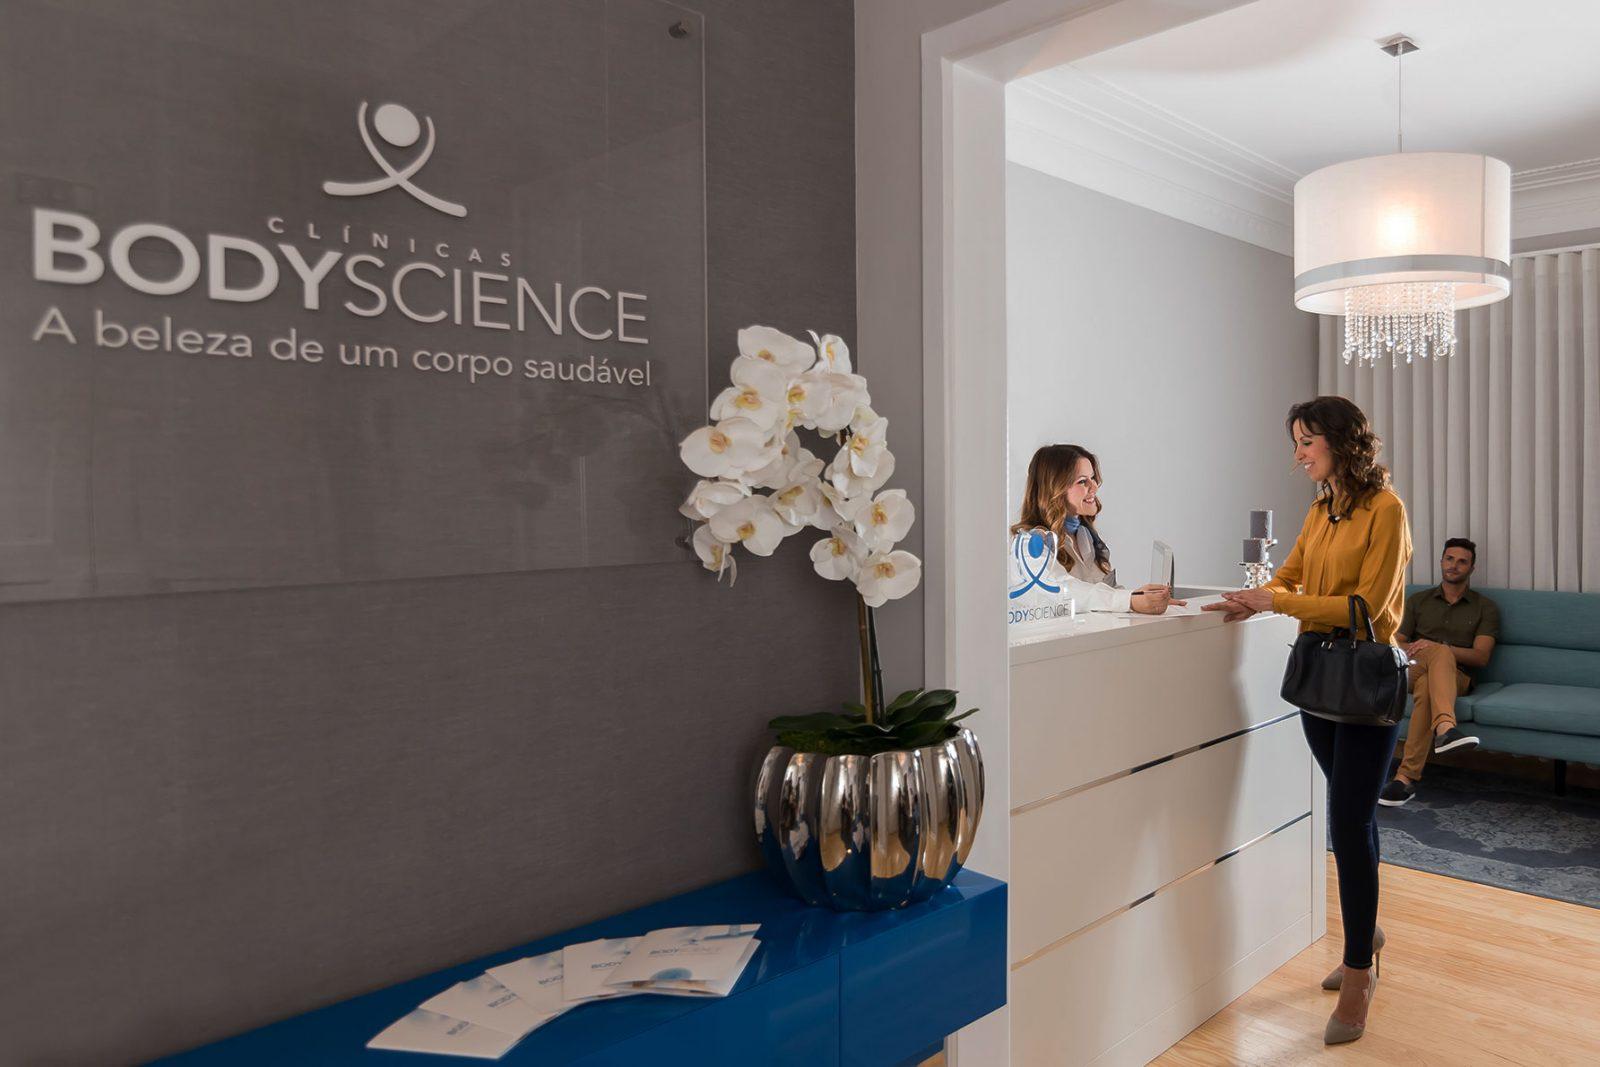 bodyscience-clinica-estetica-sobre-empresa-medicina